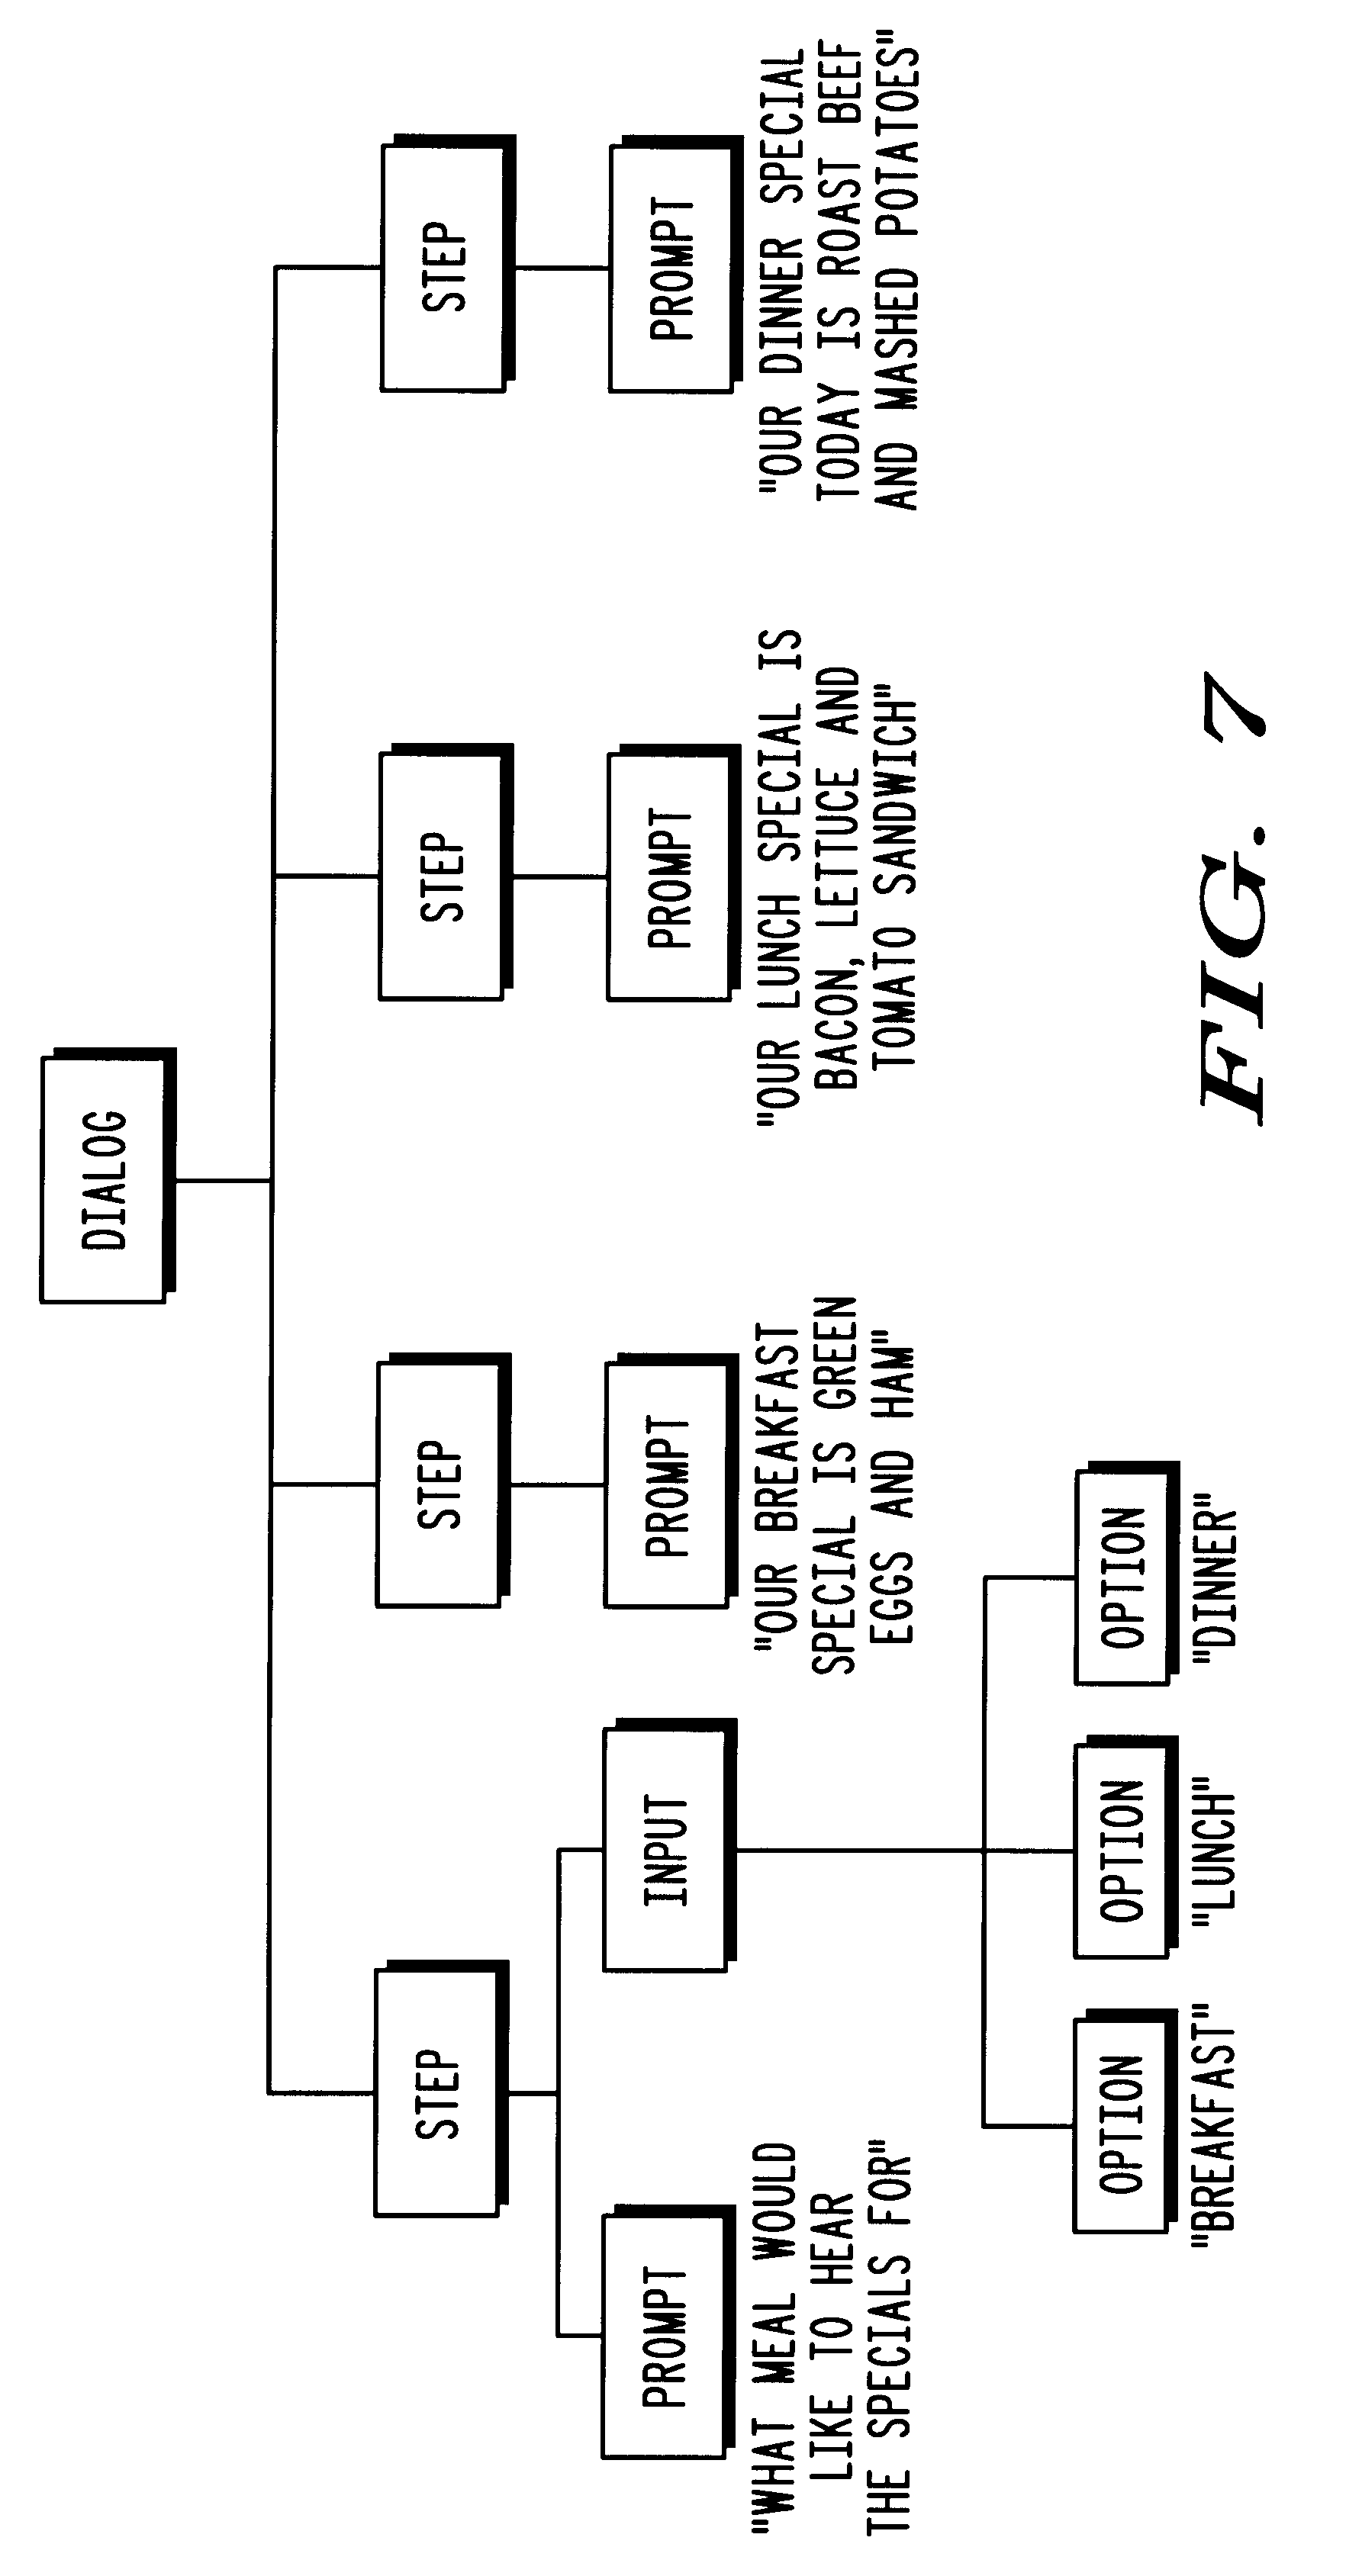 Patent US 6,269,336 B1